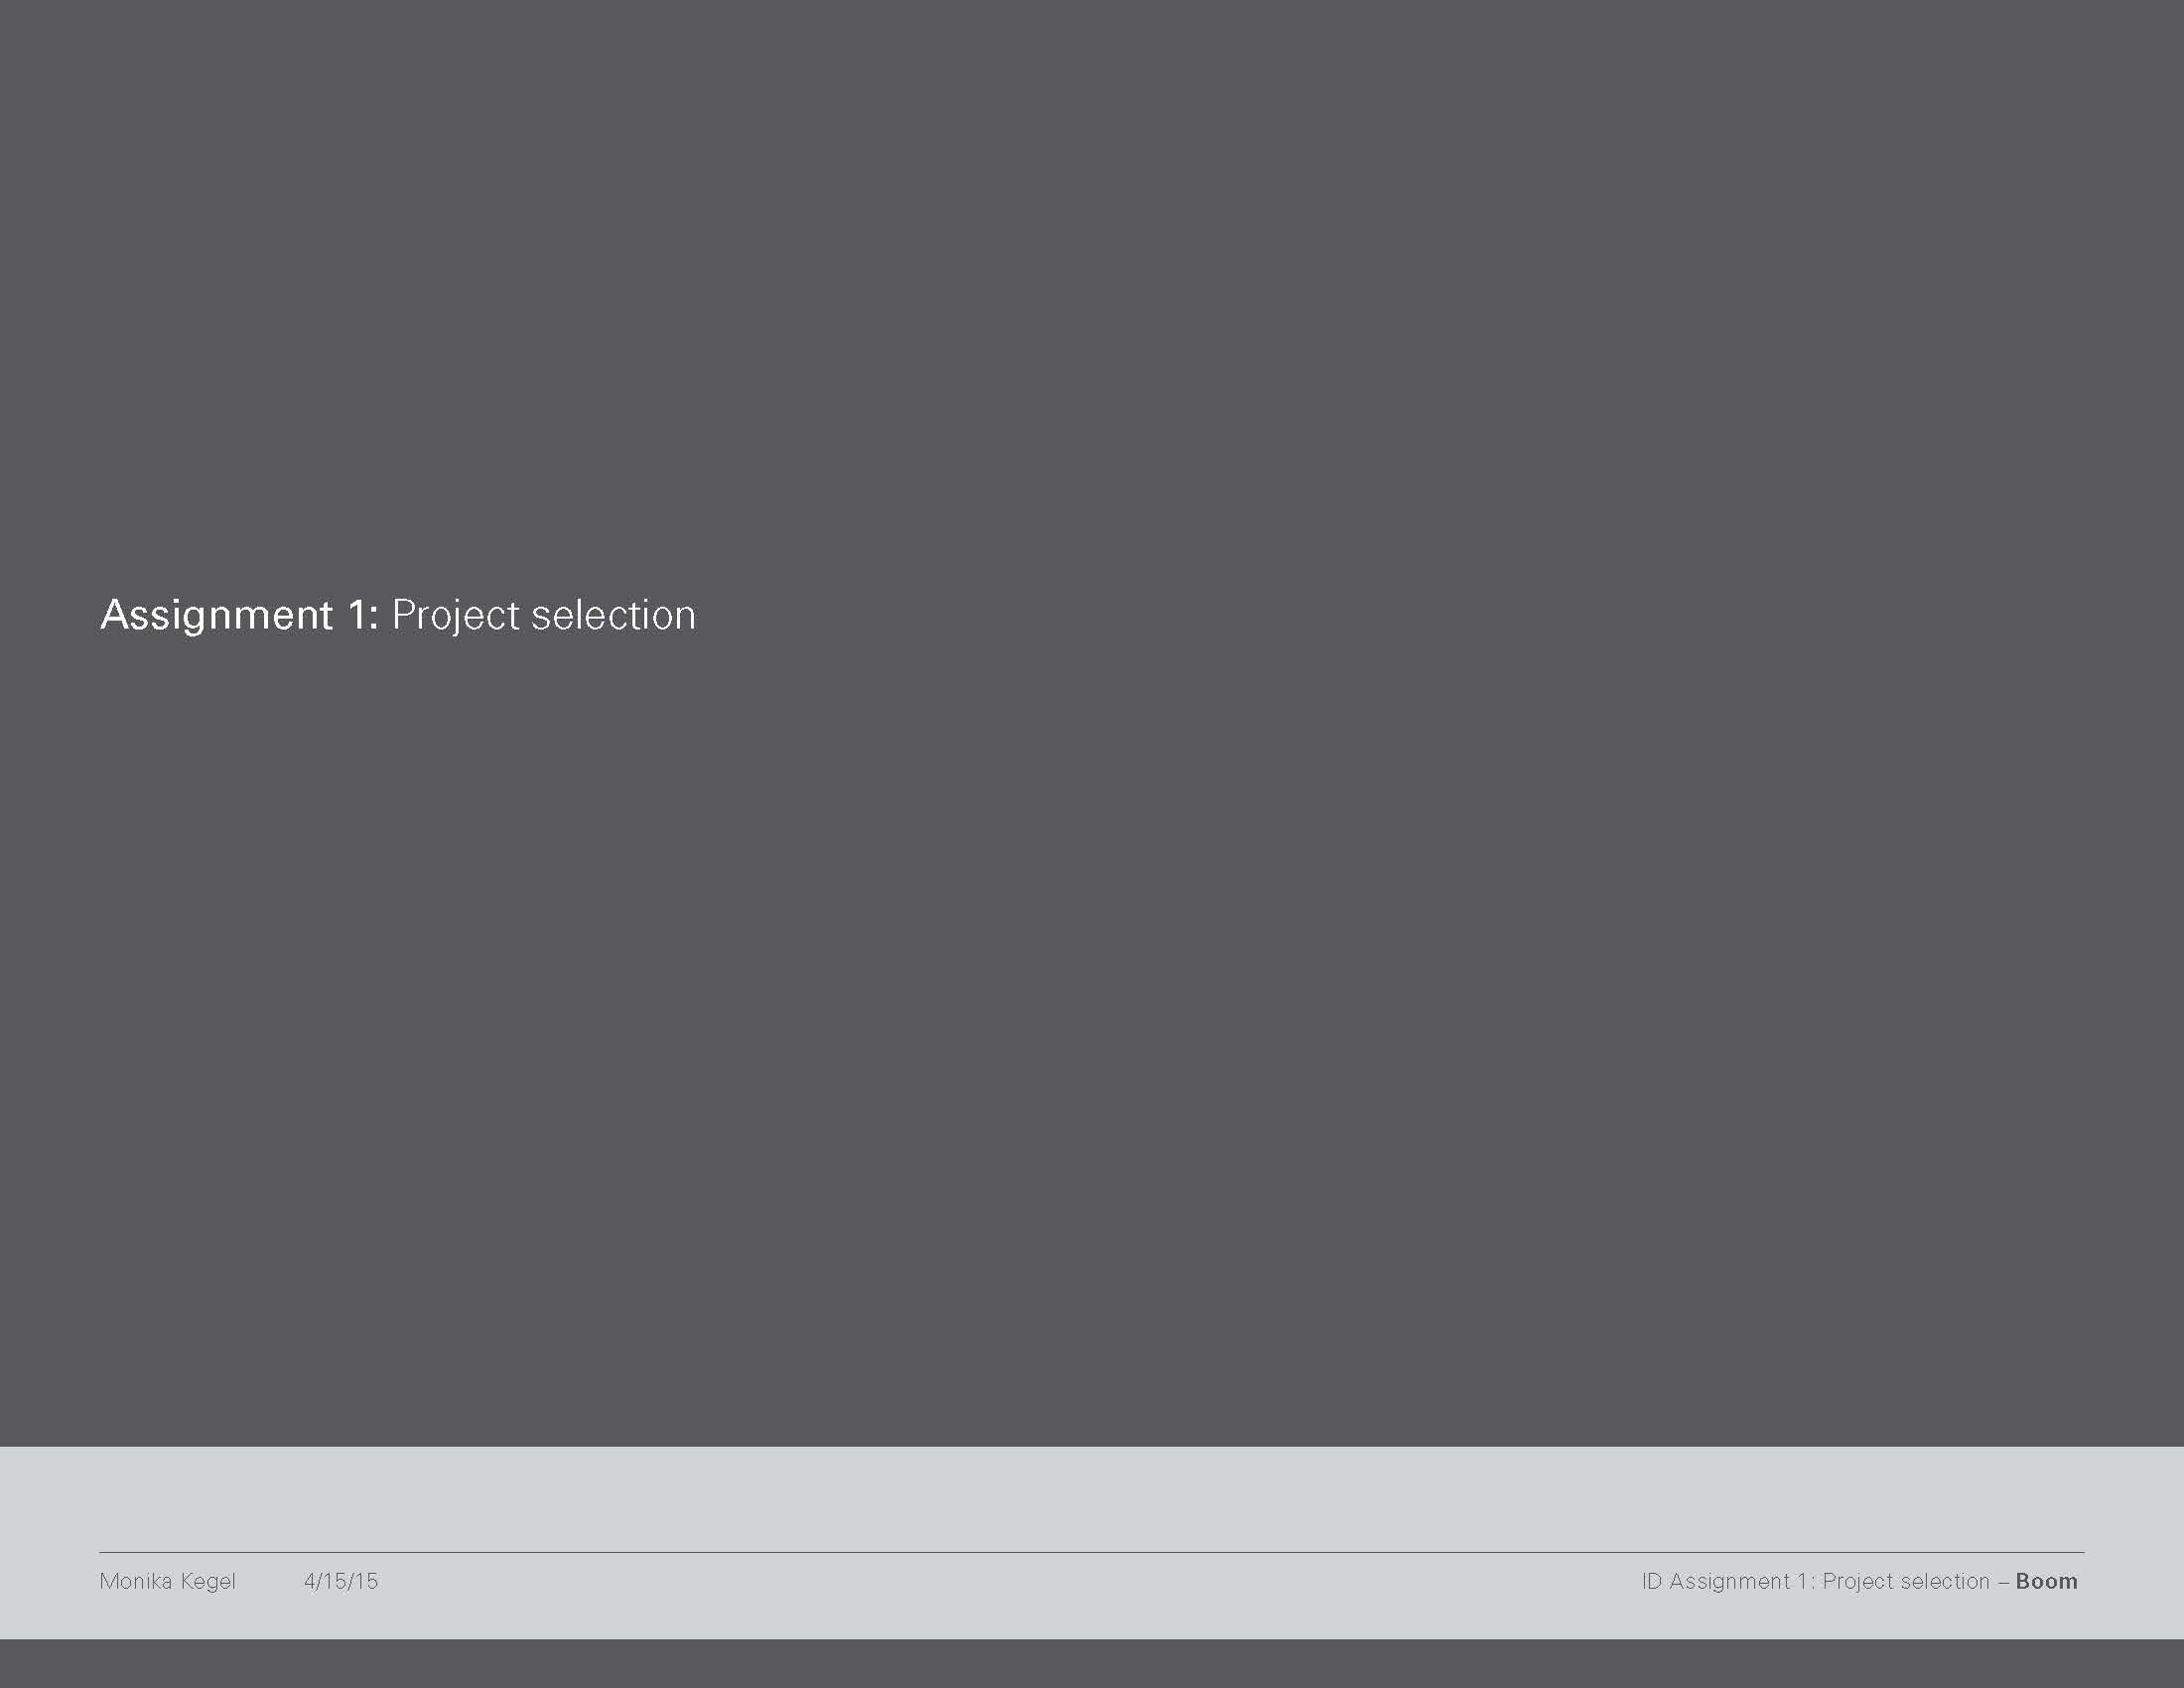 Kegel_Assignment1_ID_Page_01.jpg